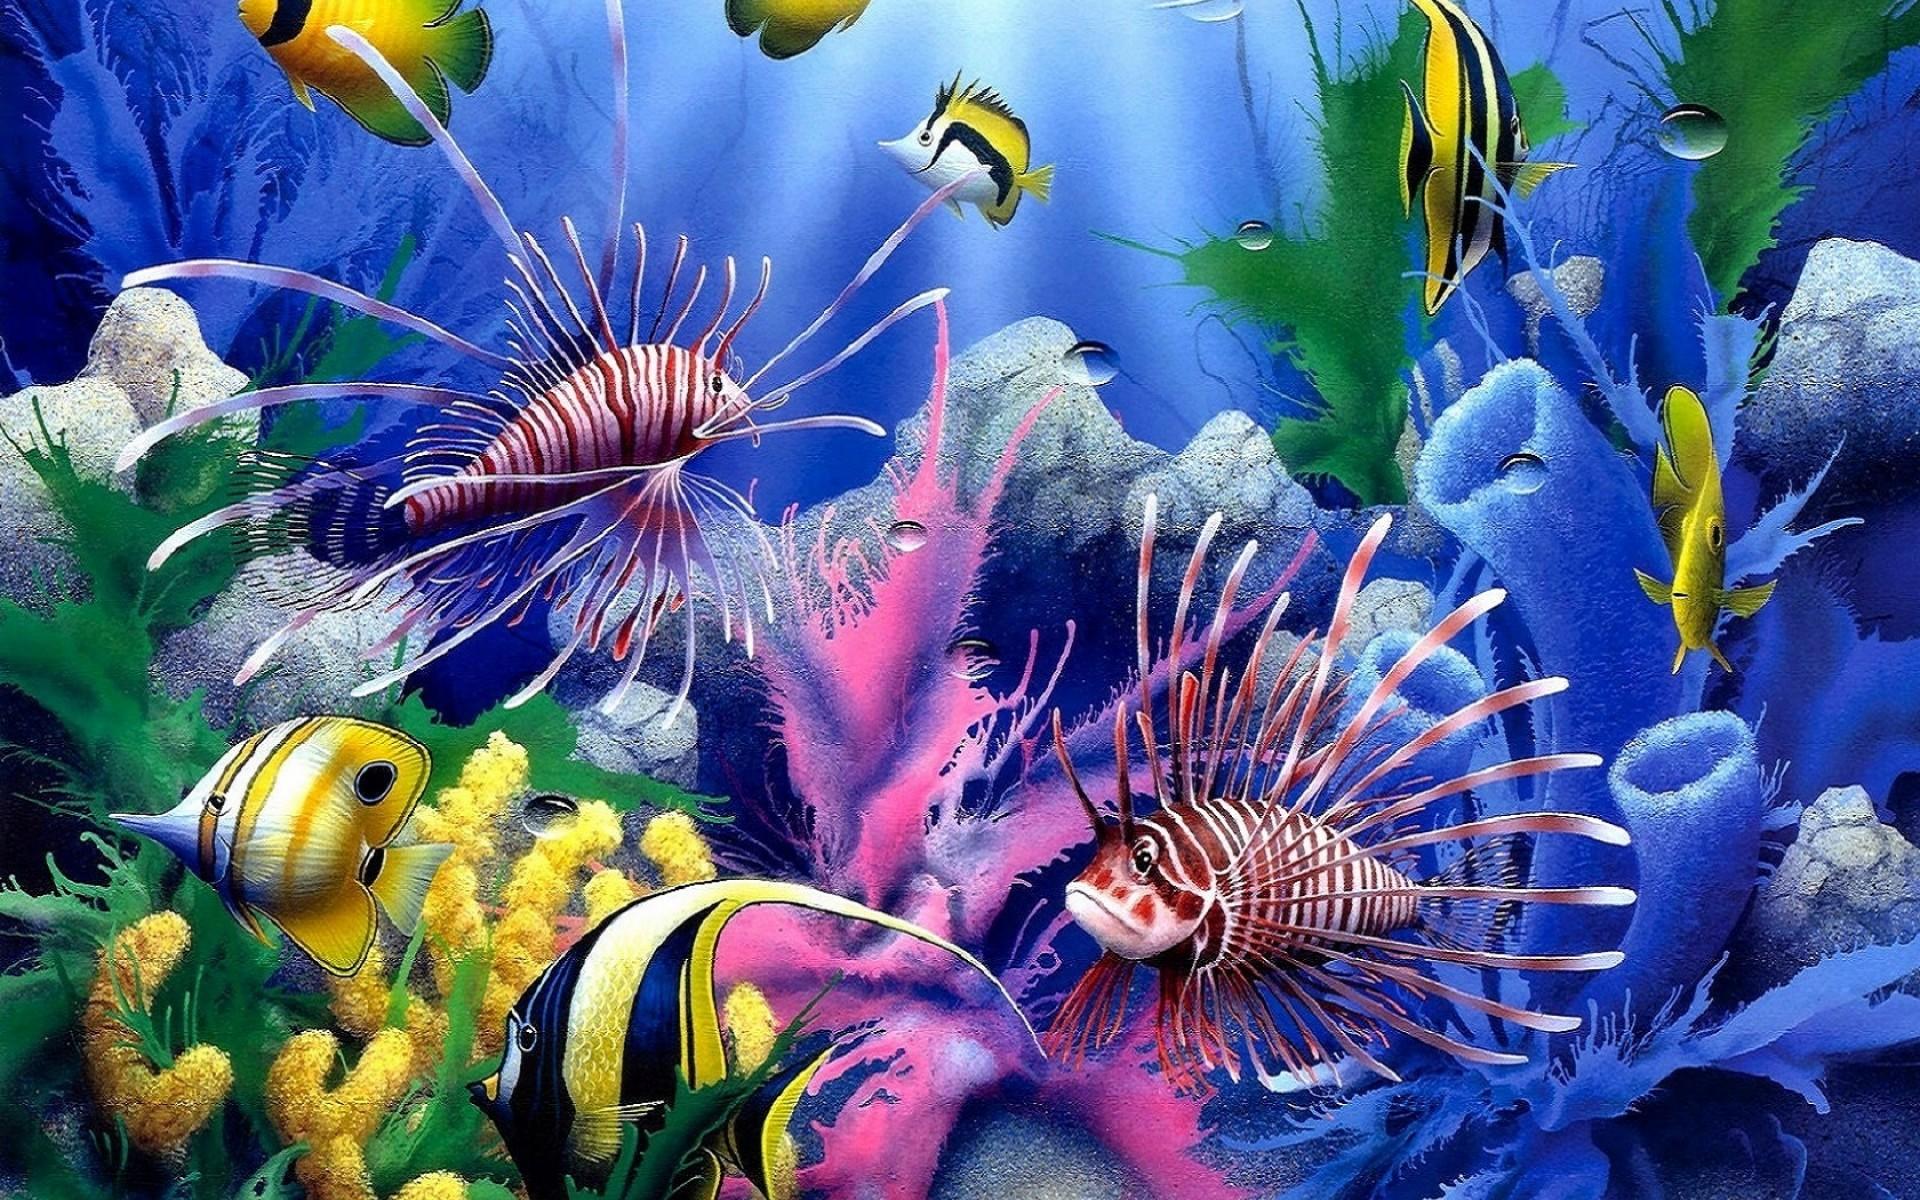 Desktop Images Nature Background Images Windows 10 Mac Wallpaper 1920x1200